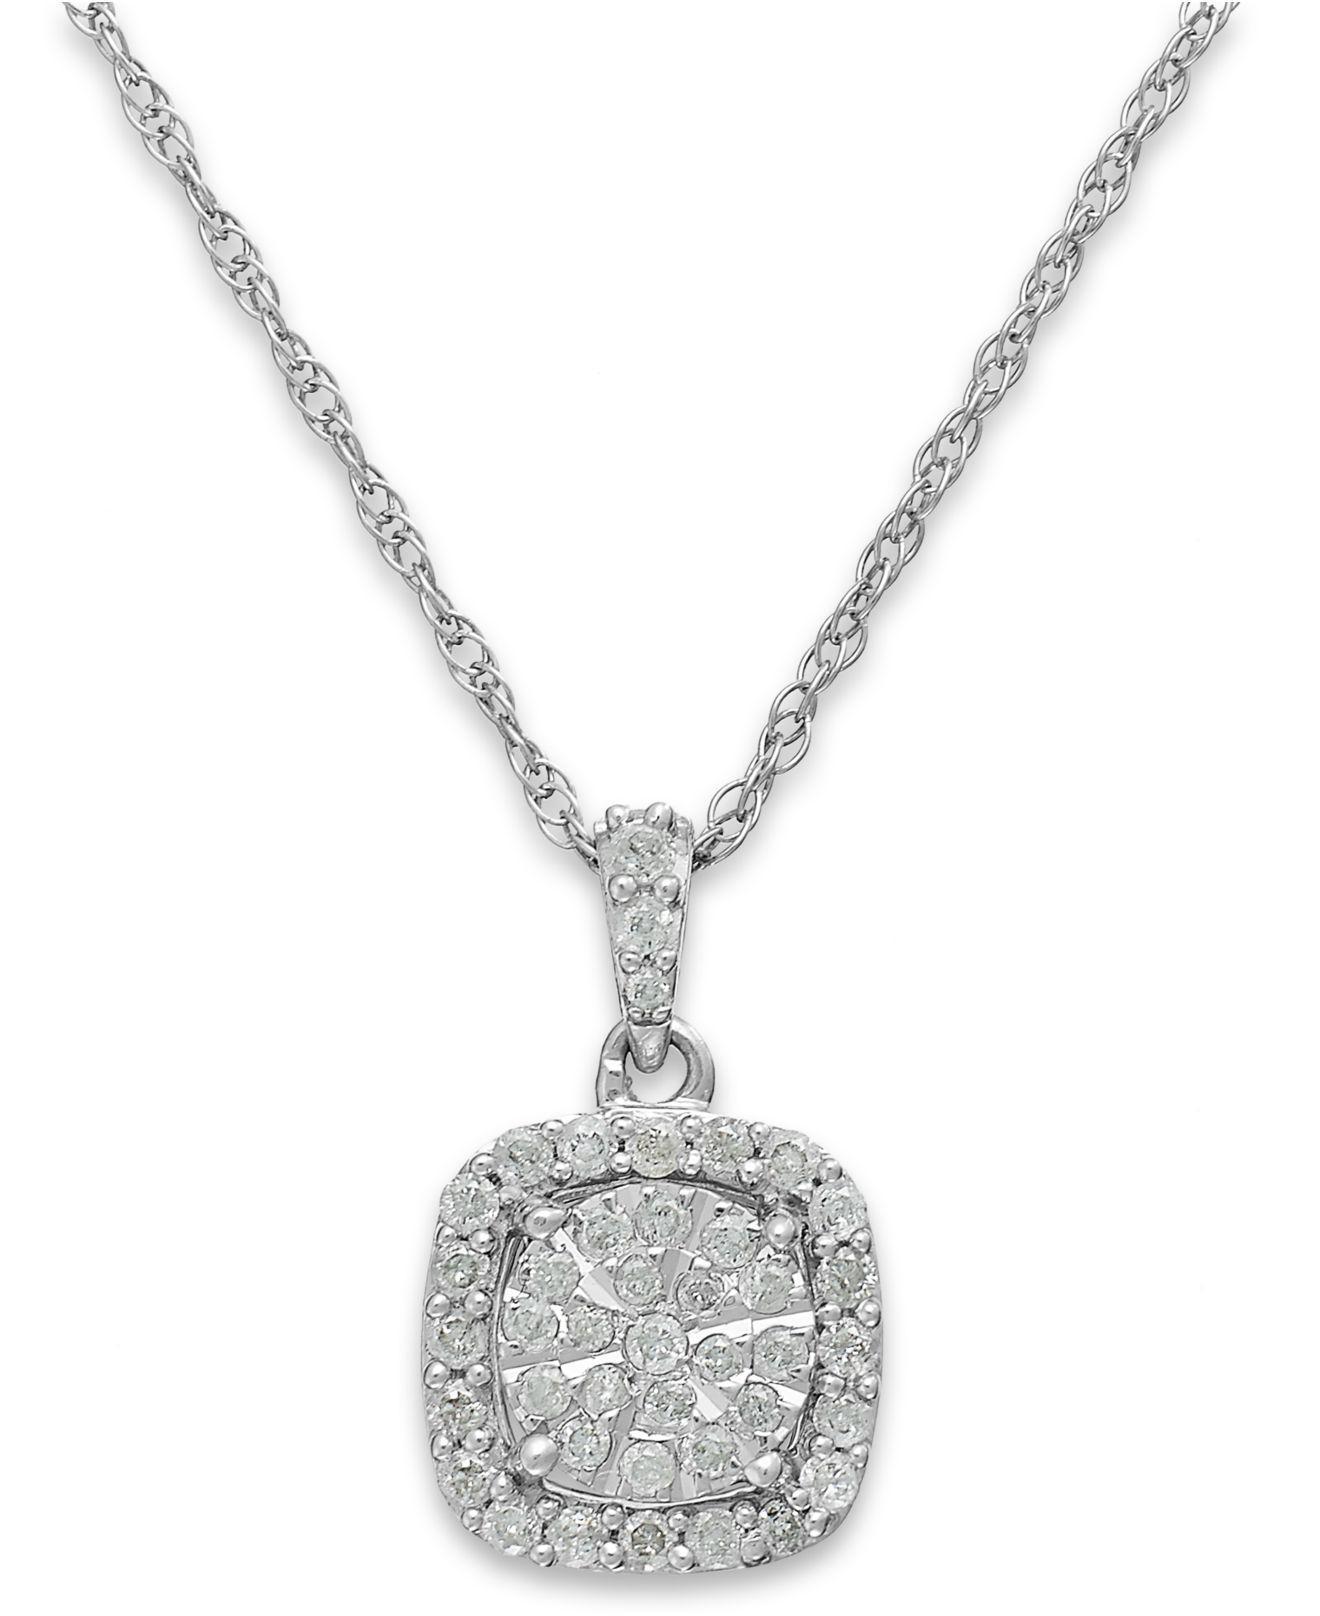 Gurhan Malibu Cushion Pendant Necklace isDGbncvm